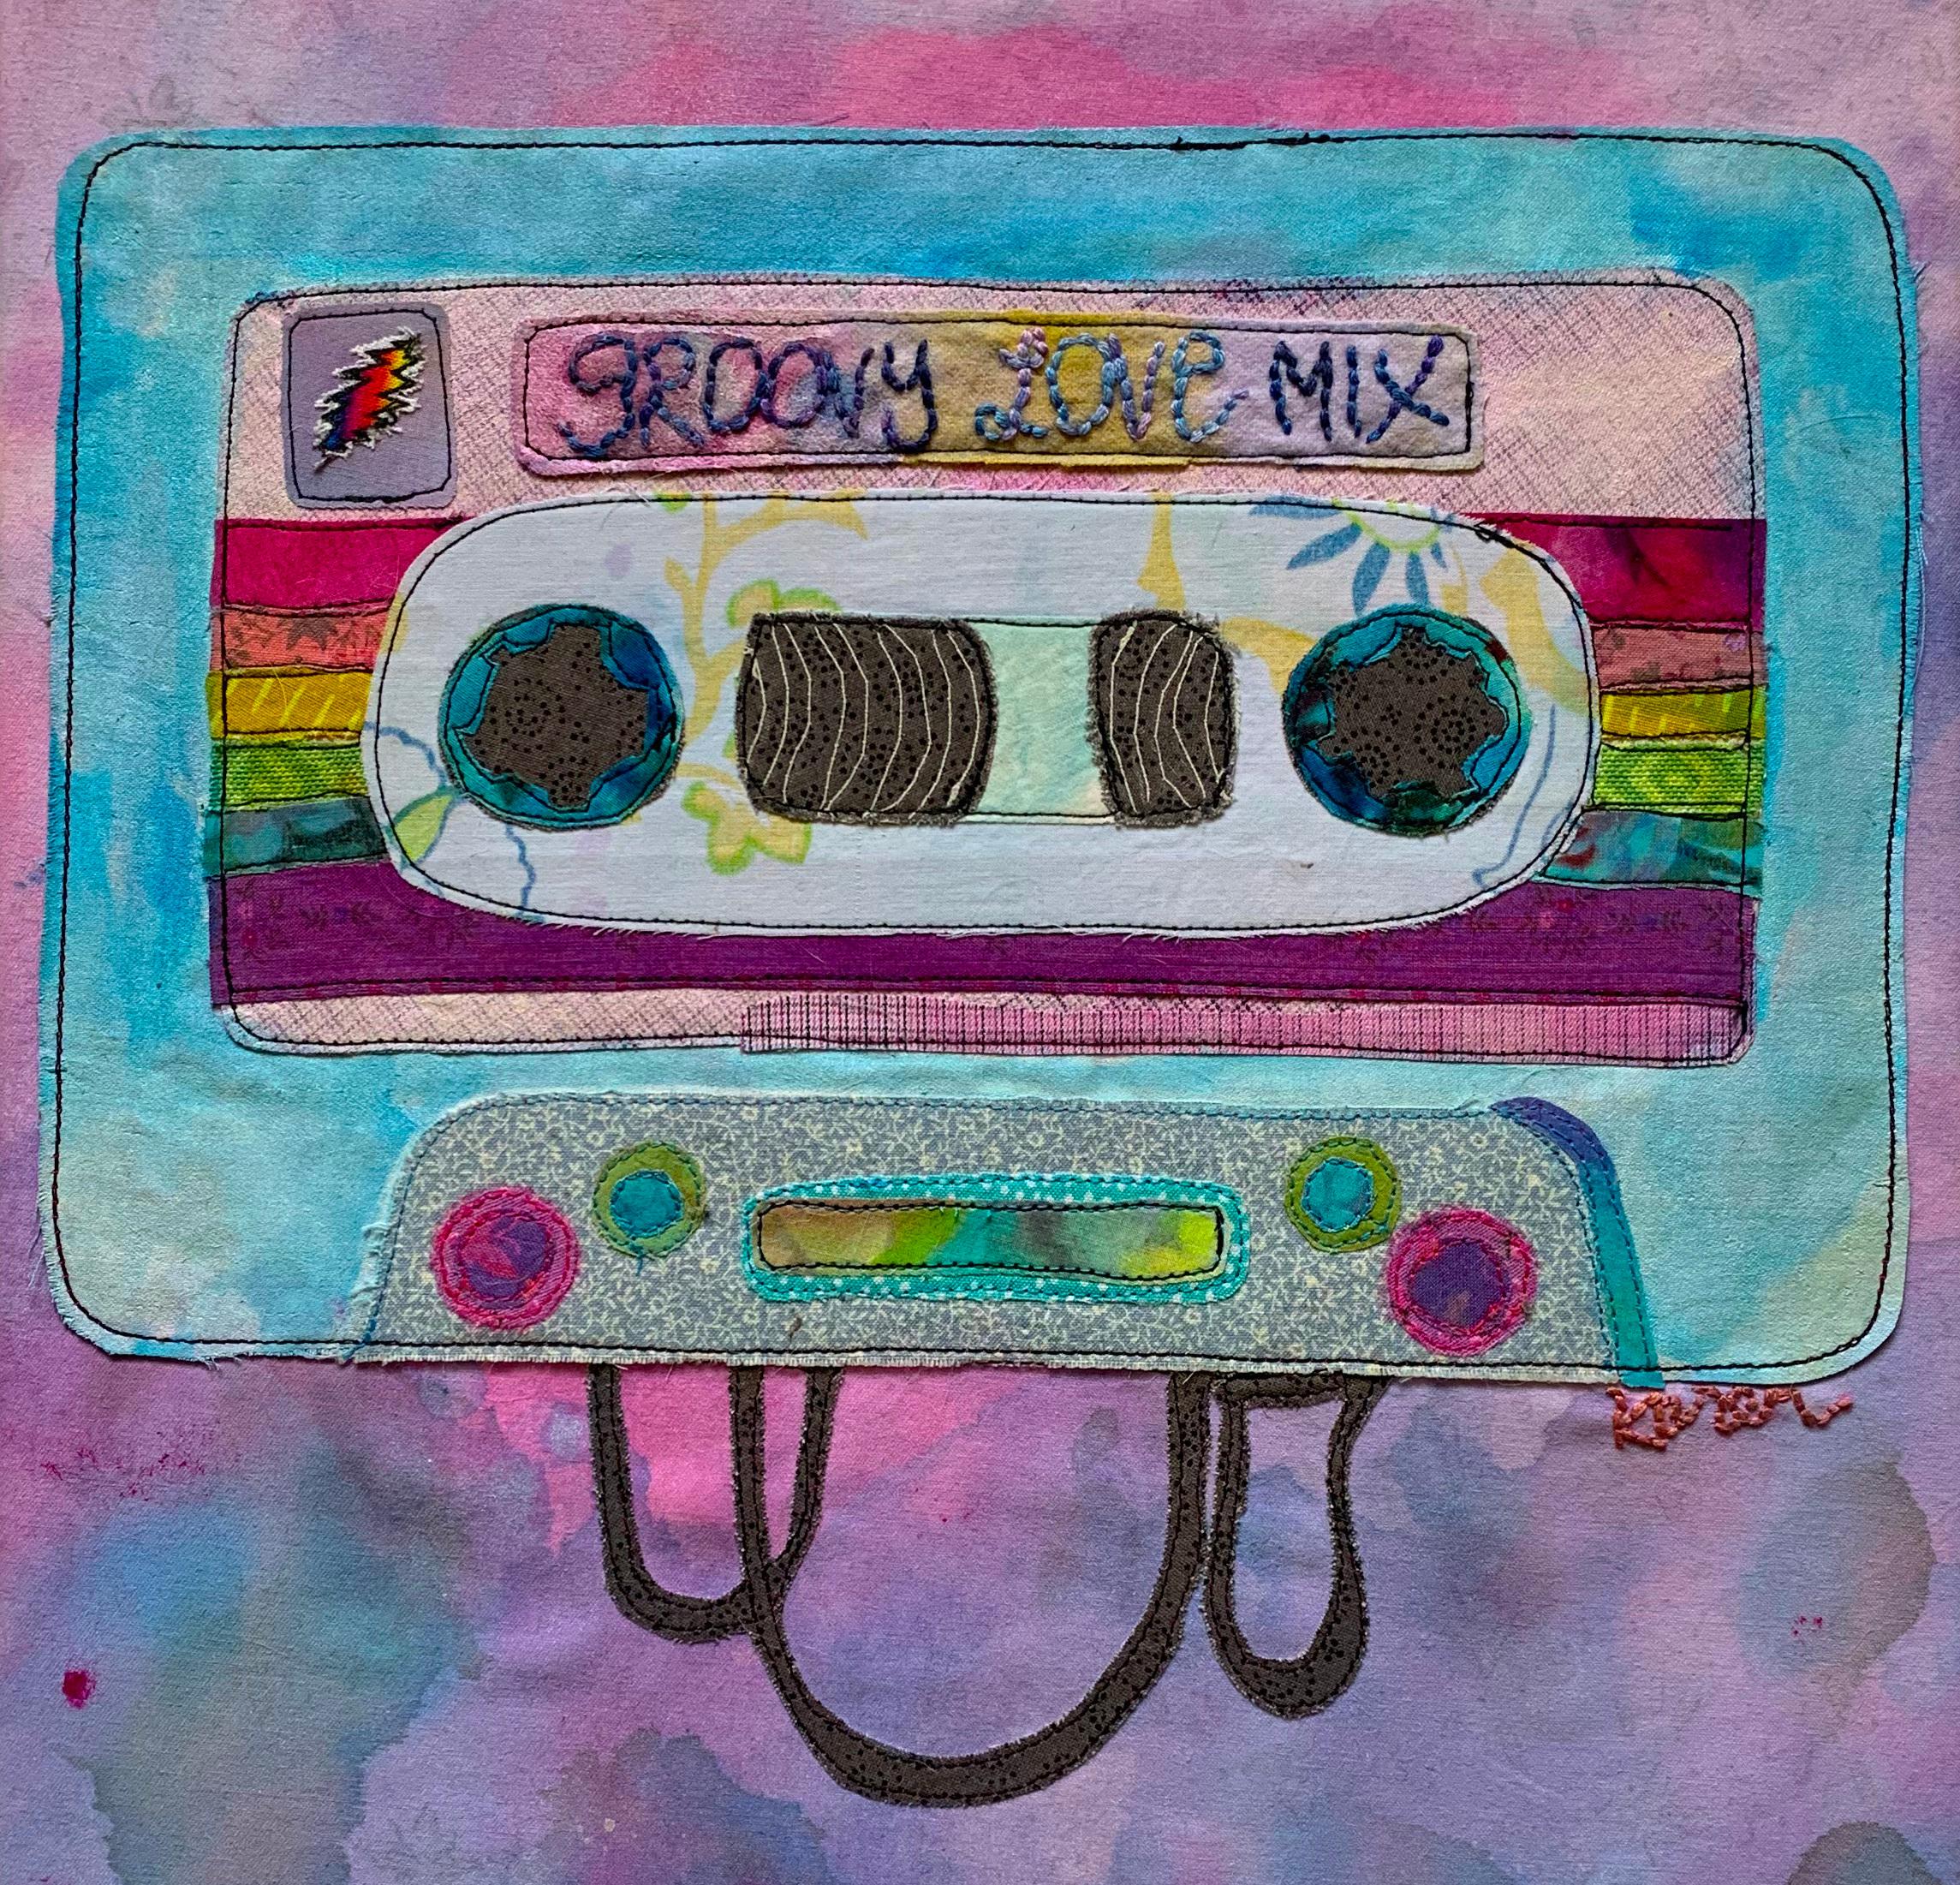 Groovy mix tape auvua1